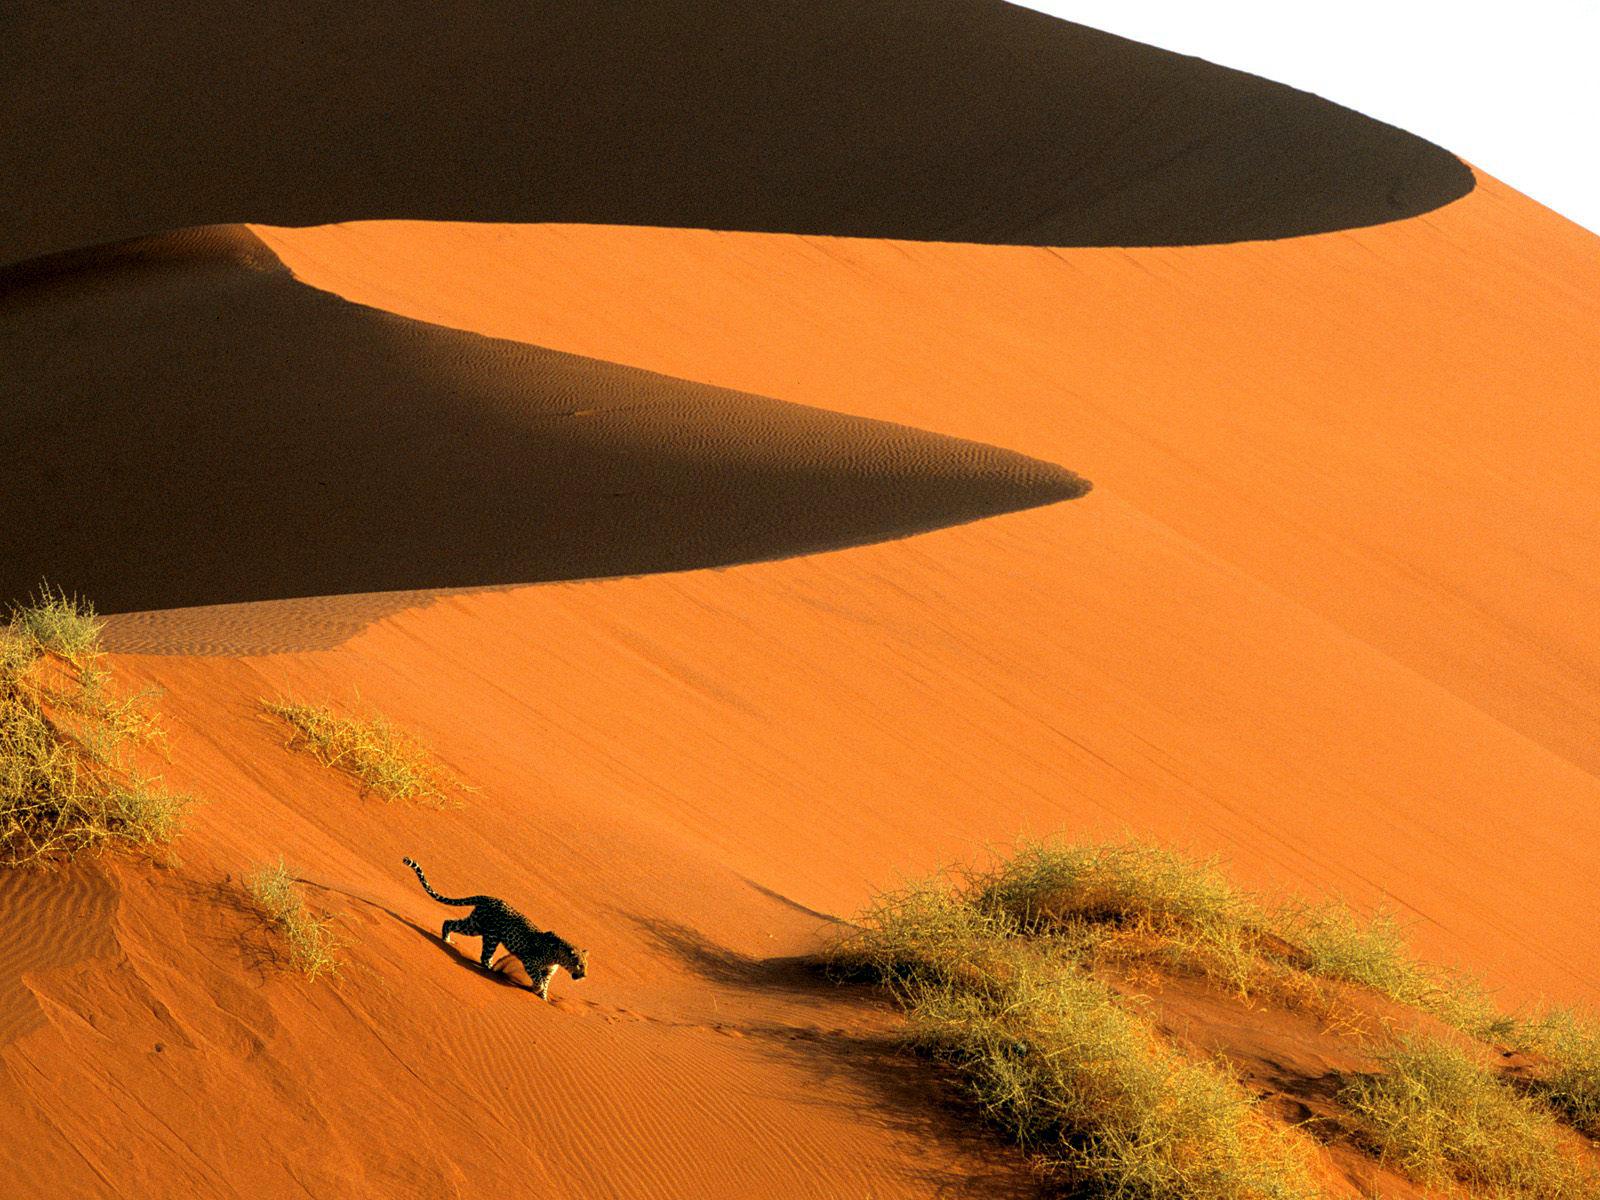 sand dunes wallpaper